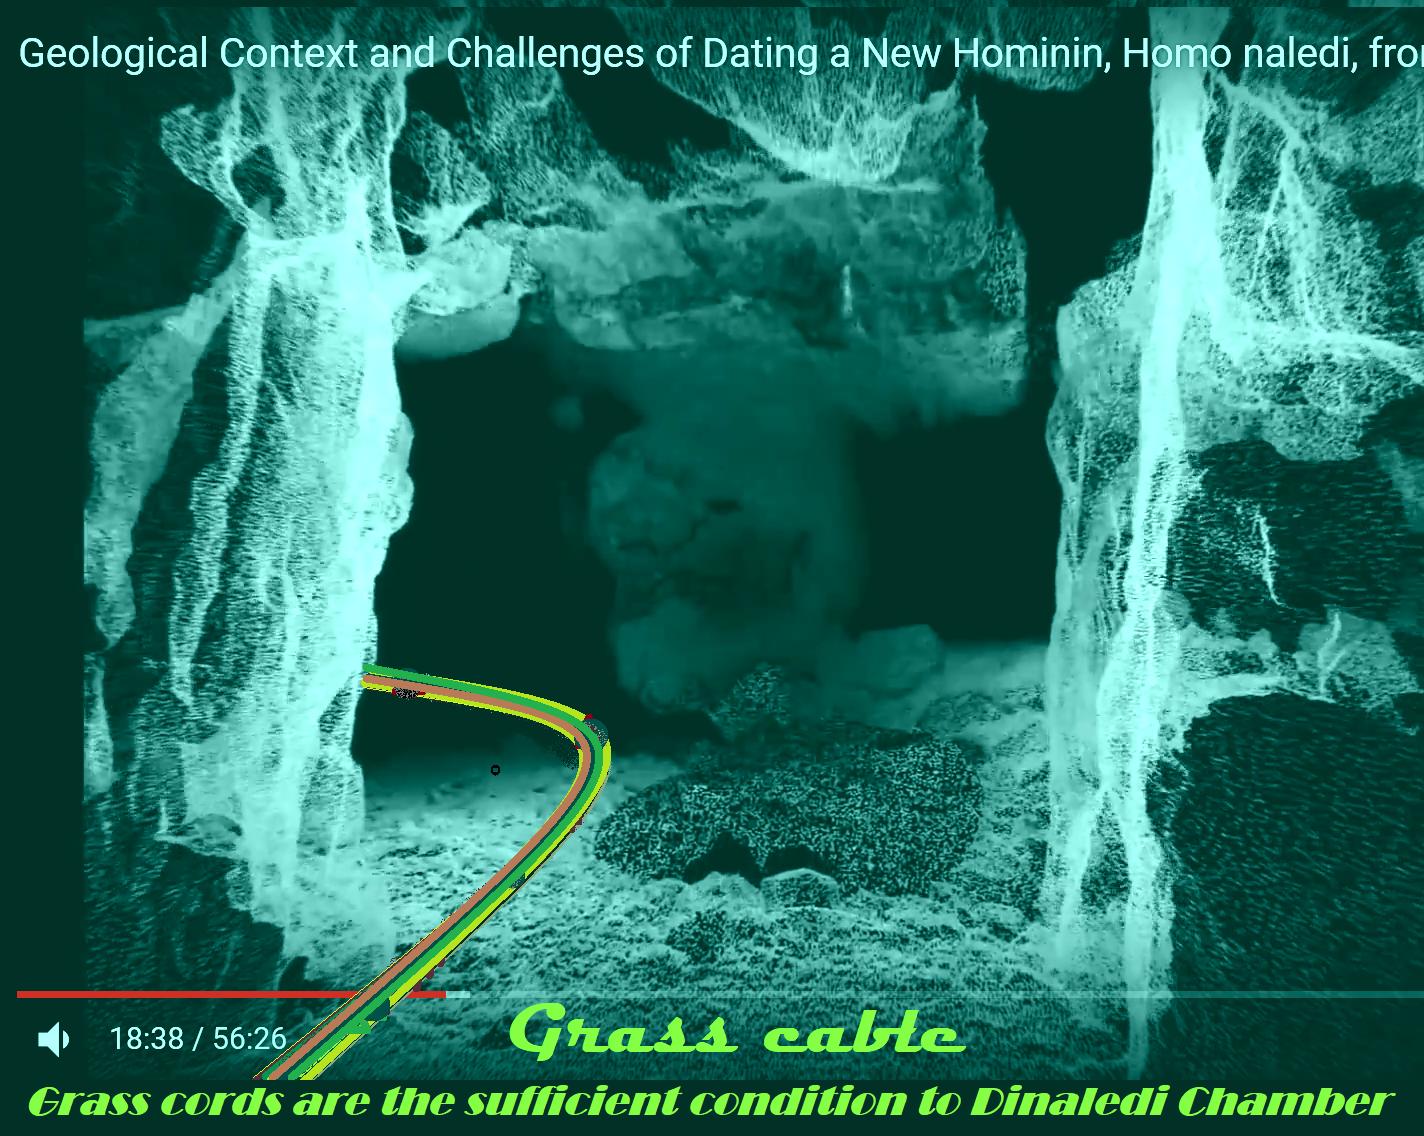 Homo naledi datingAngelfish dating Brisbane